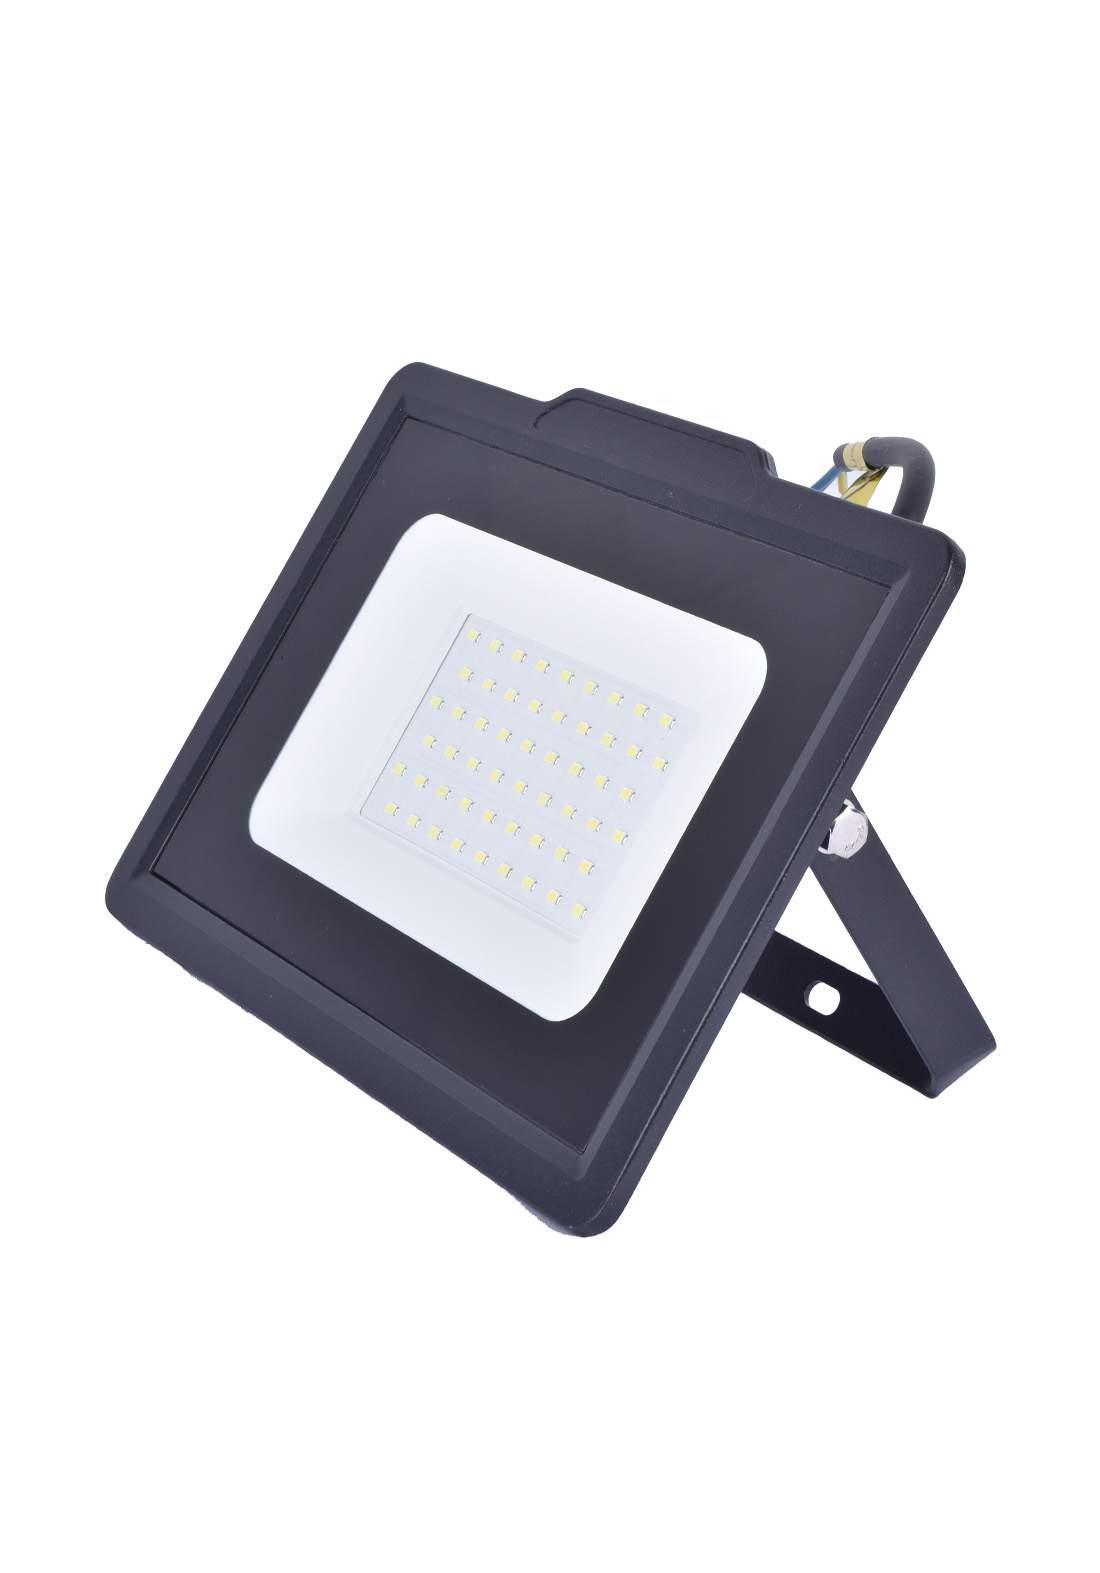 Bg EFL50W65 Led Flood Light 50 Watt بروجكتر ليد